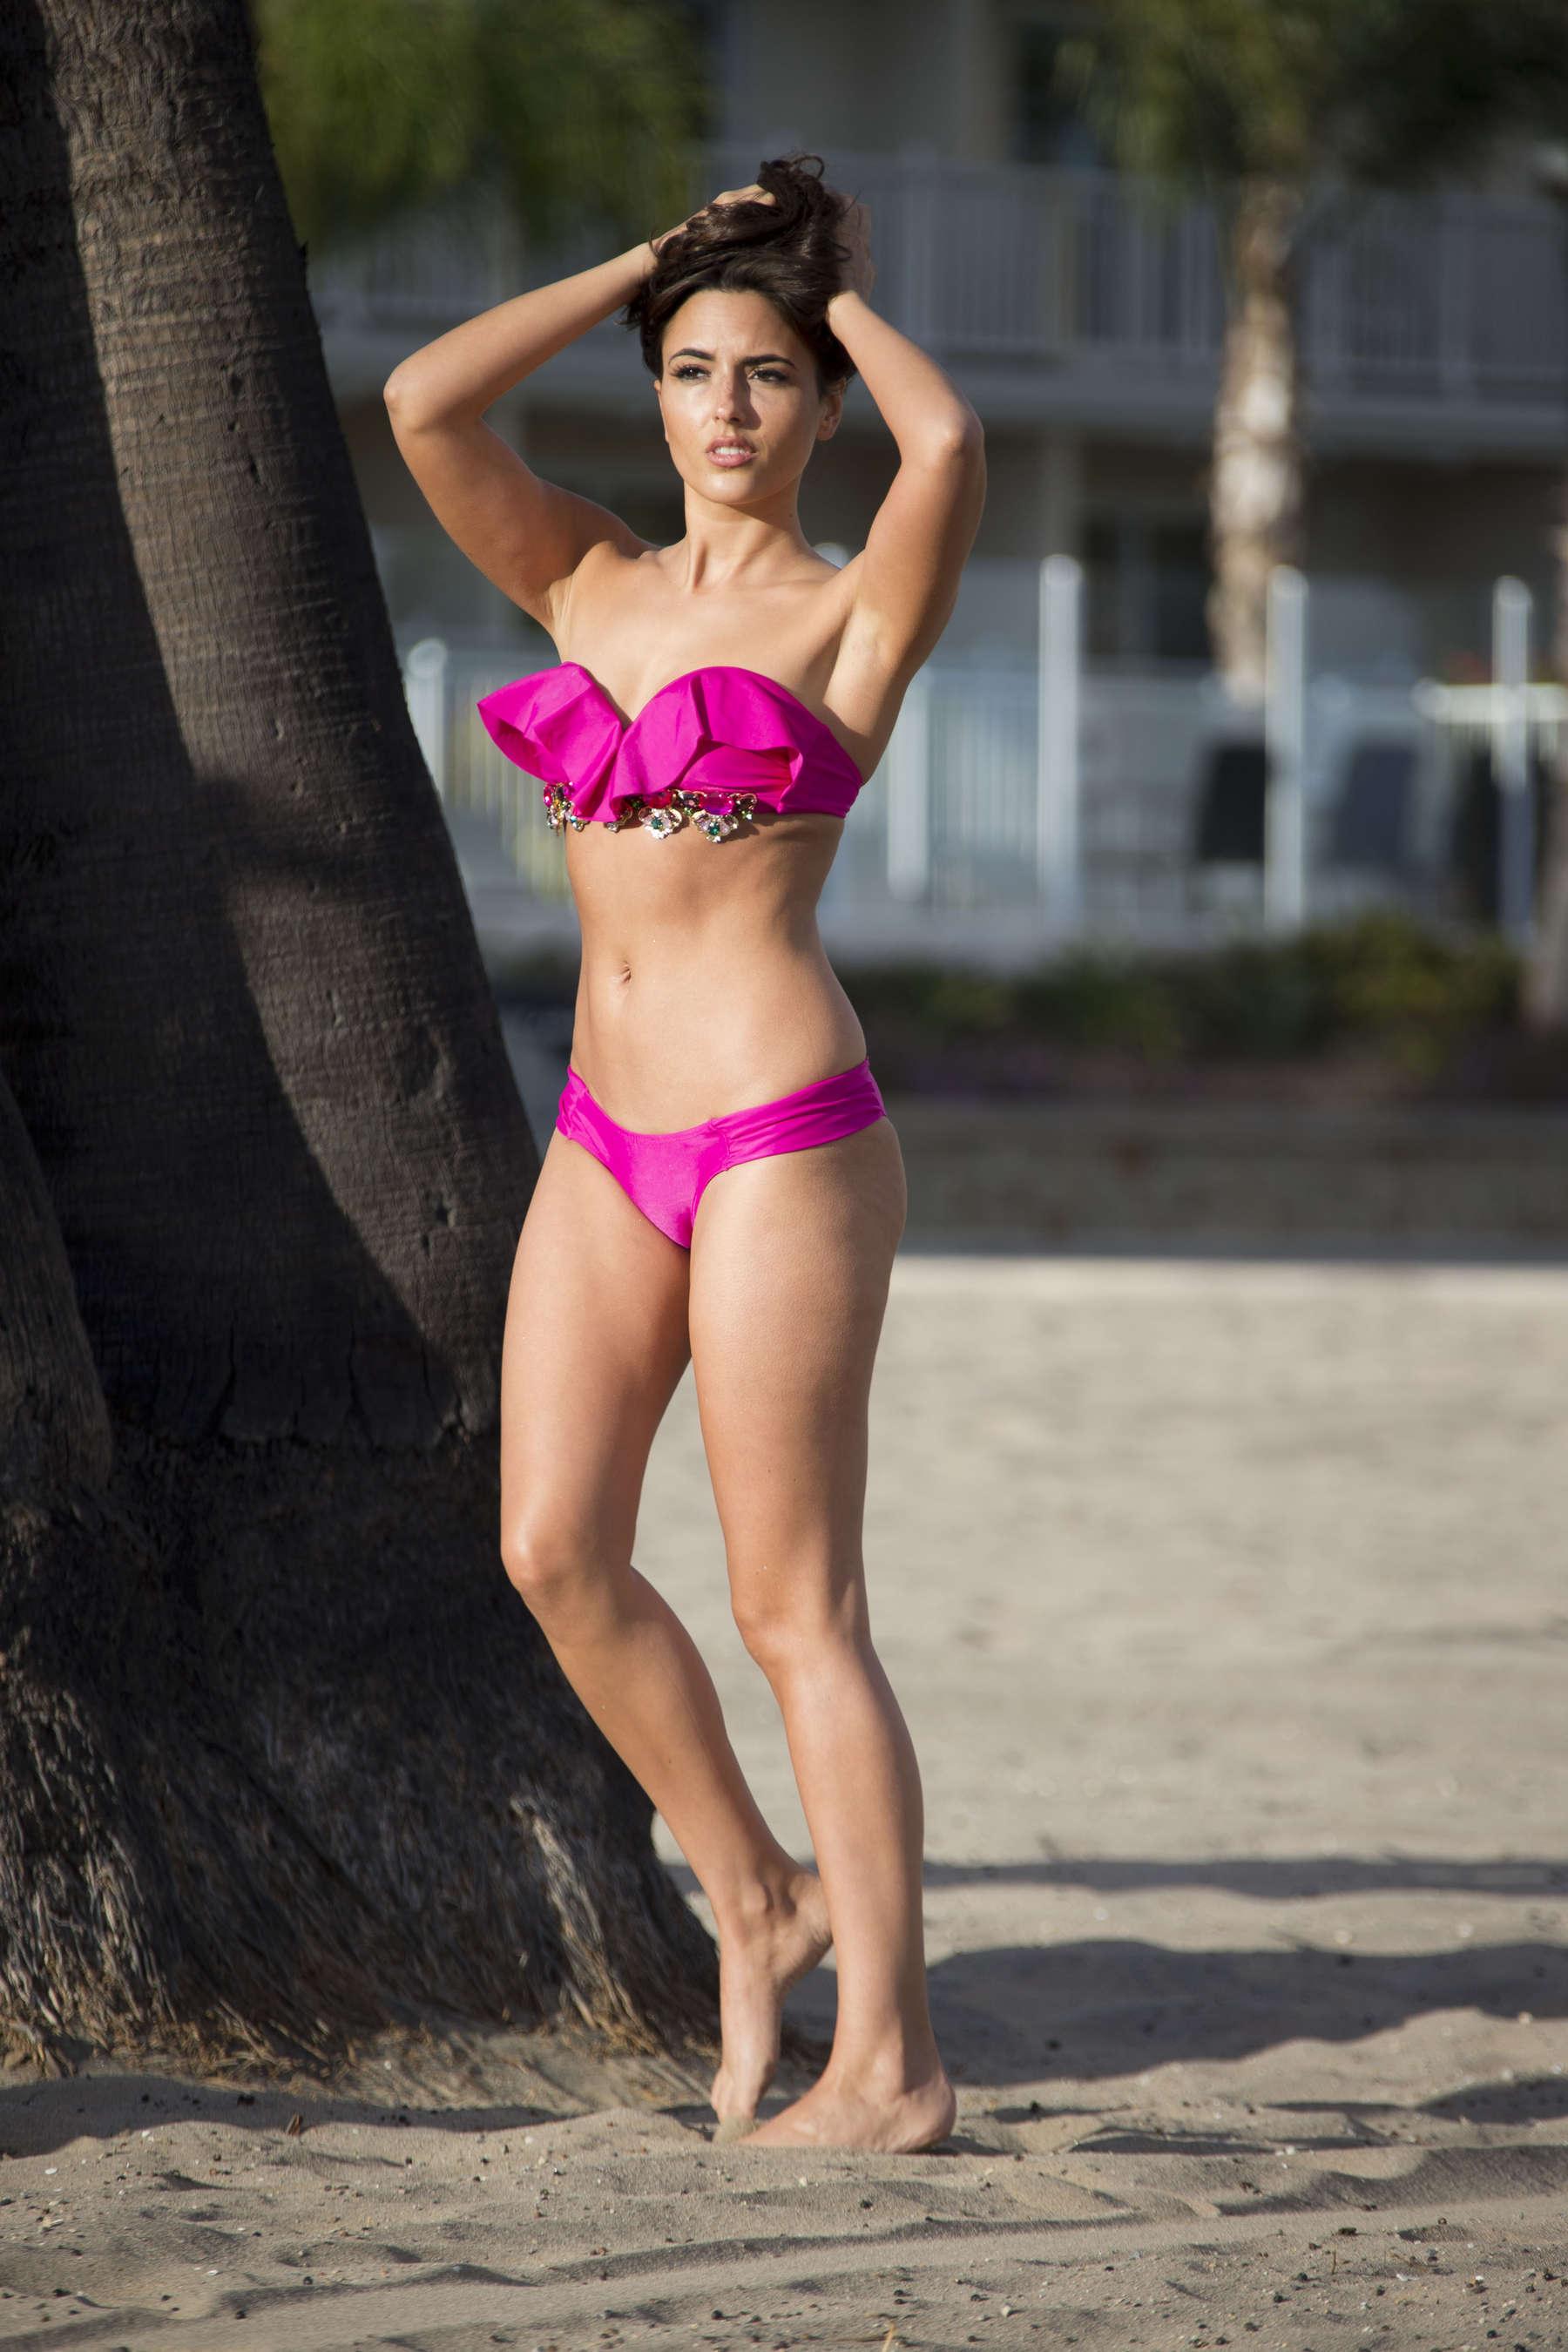 Nadia Forde 2016 : Nadia Forde in Pink Bikini -04